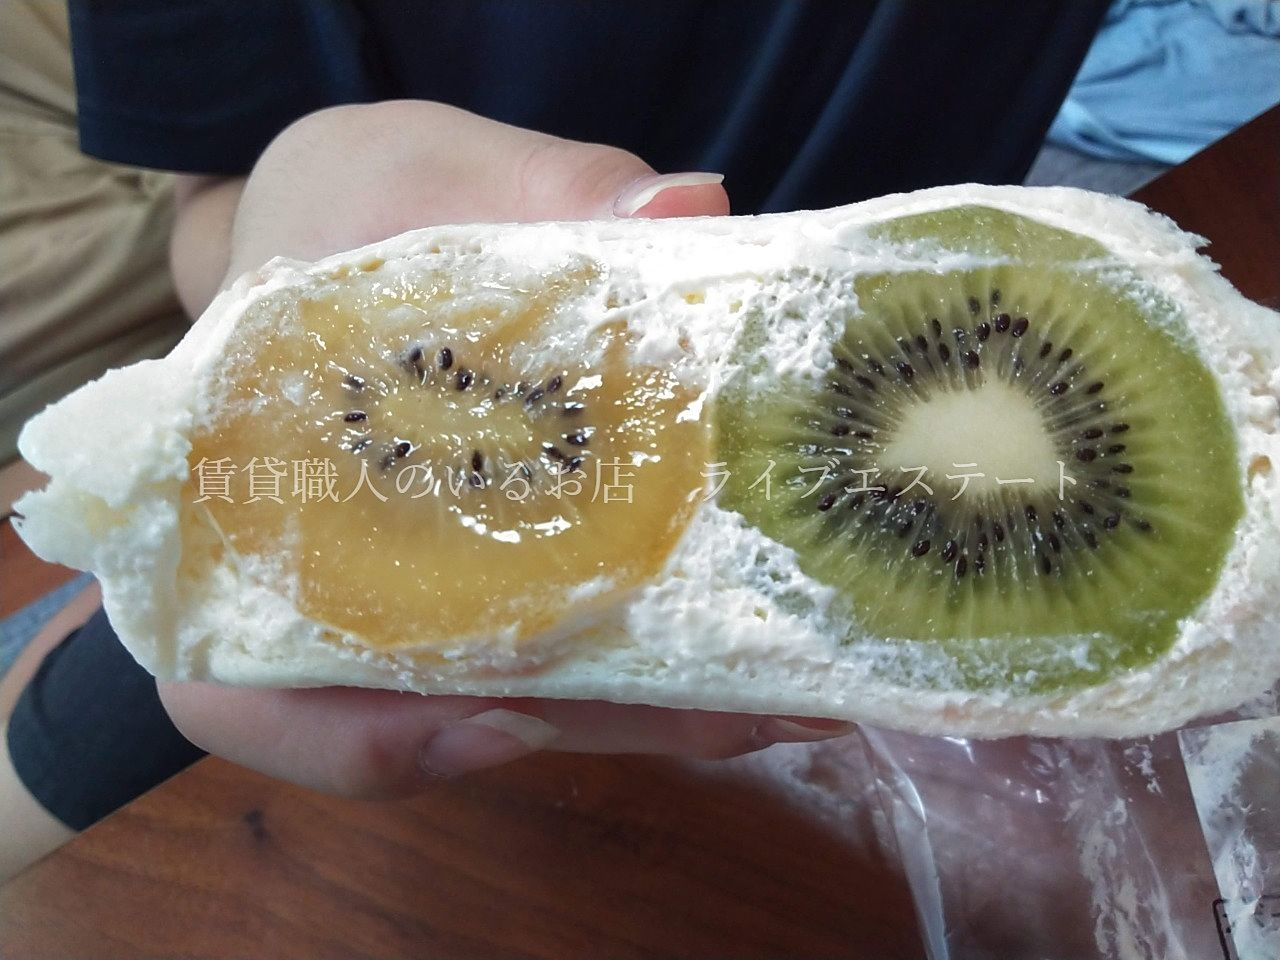 Wキウイのフルーツサンド ボムパン